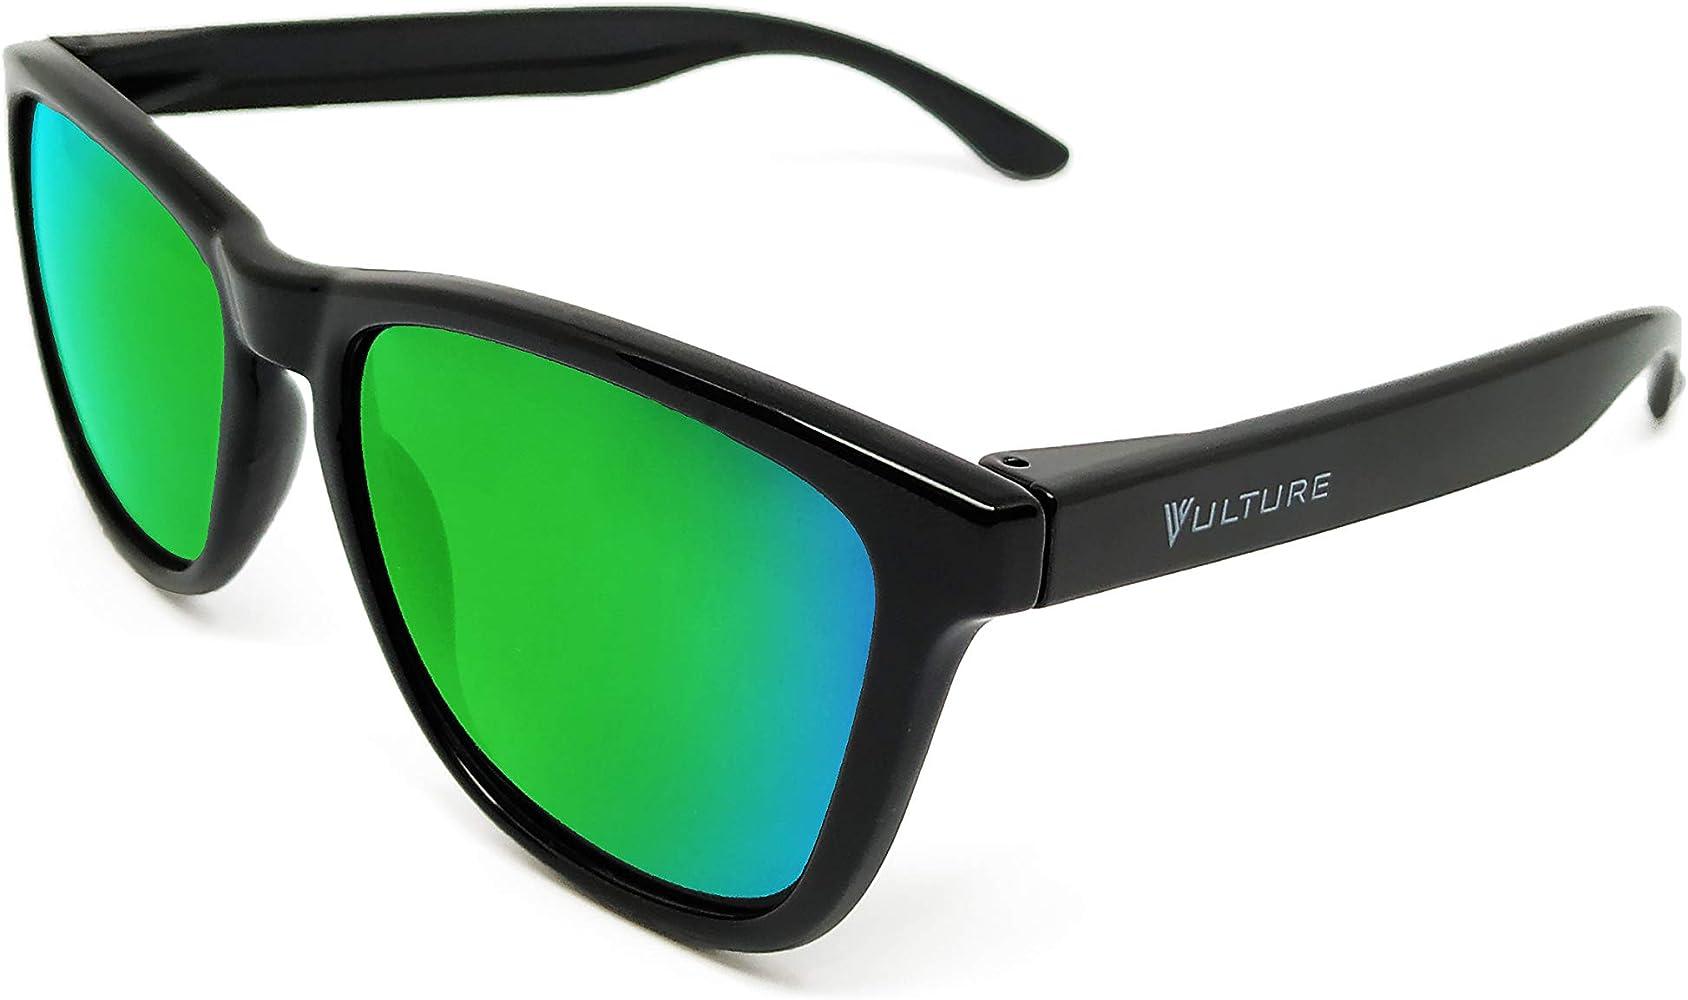 VULTURE · ALFA GREEN · Gafas de sol polarizadas con protección ...